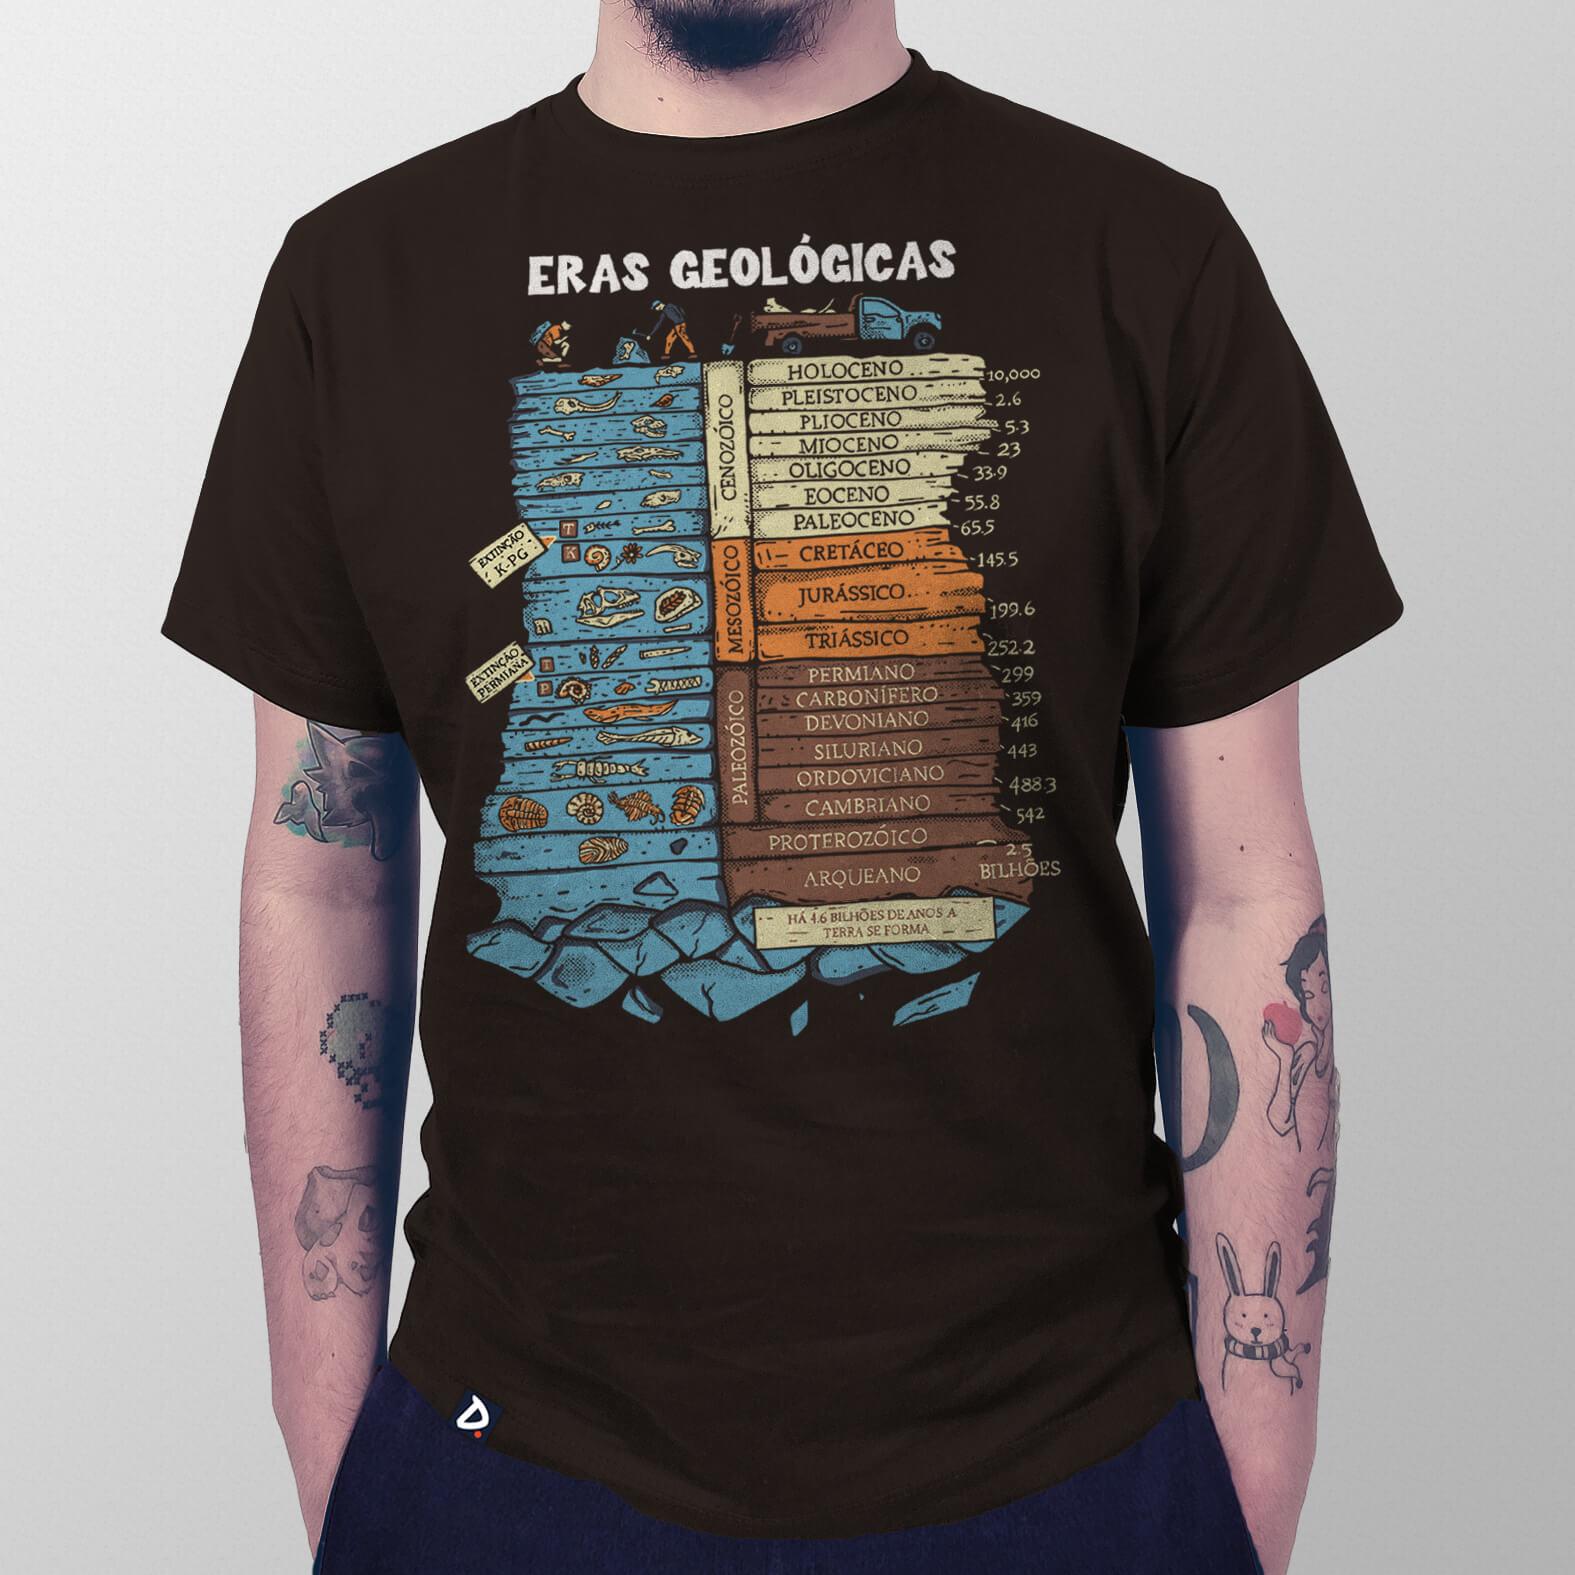 Camiseta Masculina Eras Geológicas